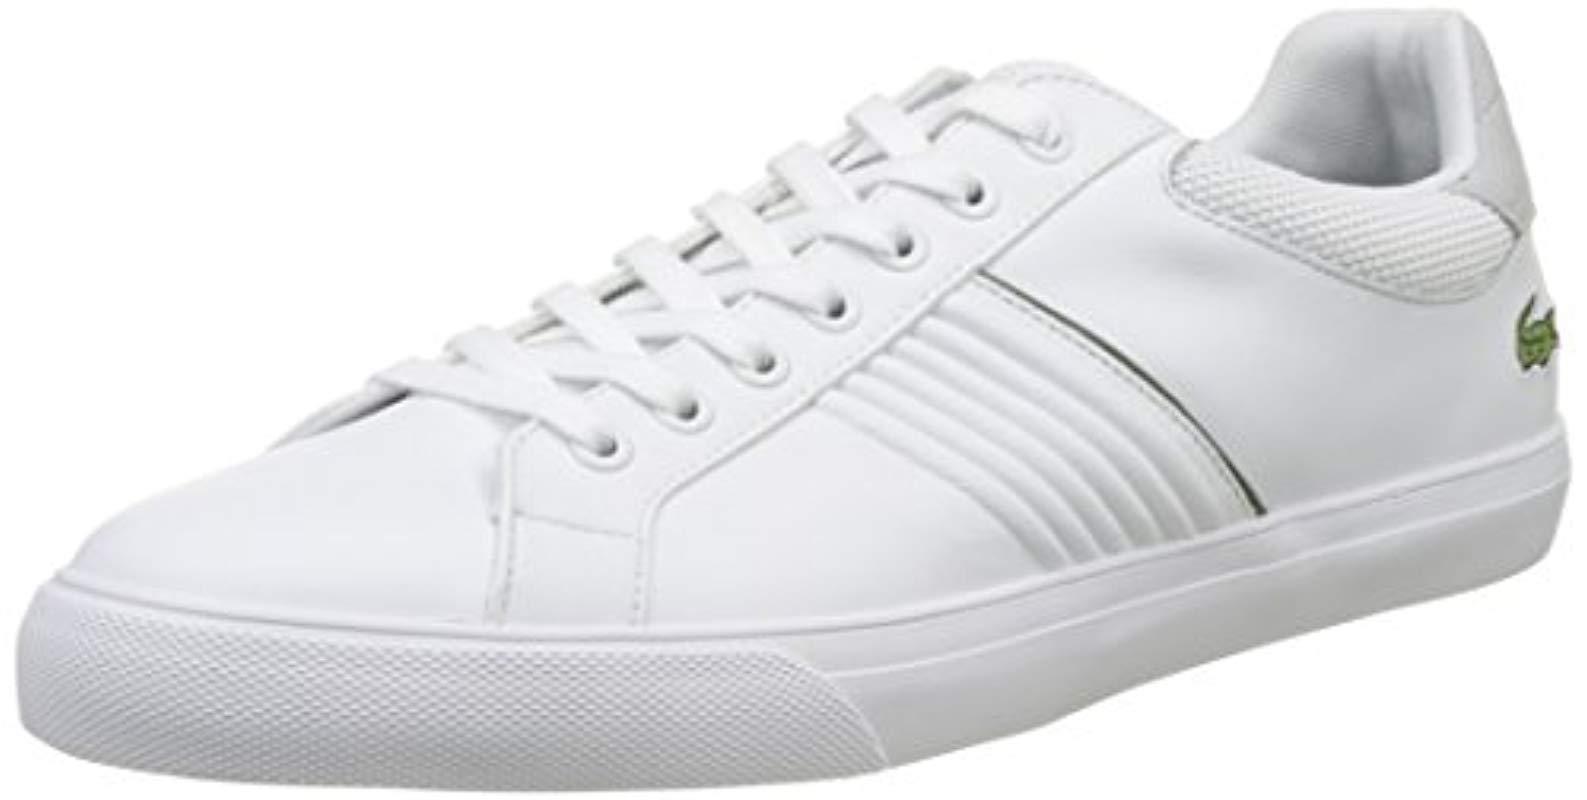 03b747be30b867 Lacoste Fairlead 117 1 Casual Shoe Fashion Sneaker in White for Men ...